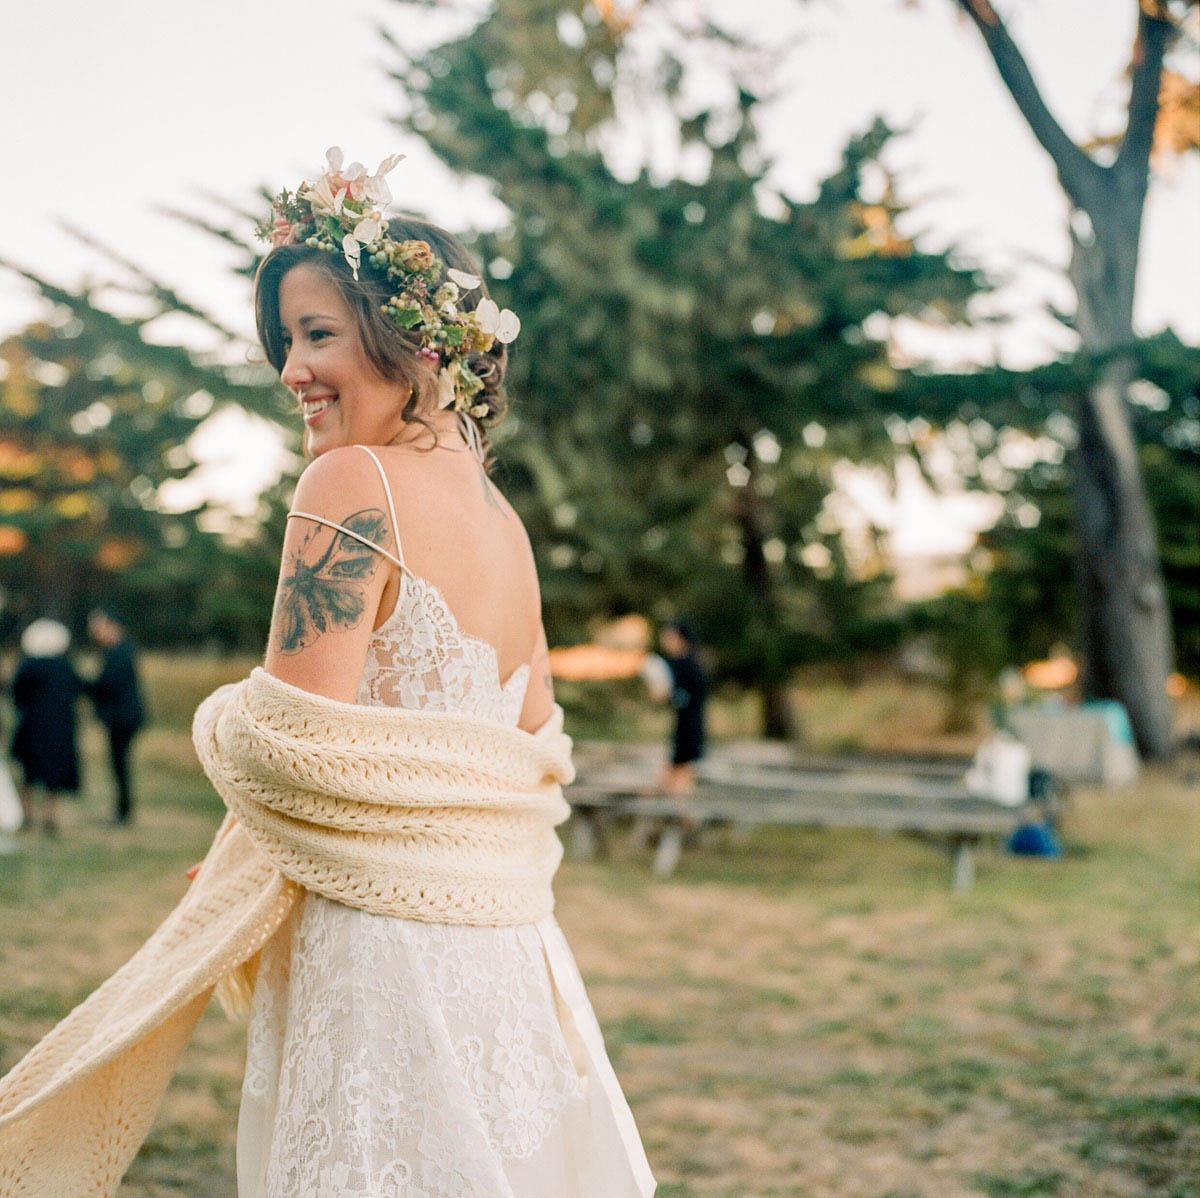 27-playful-bride-hasselblad.jpg